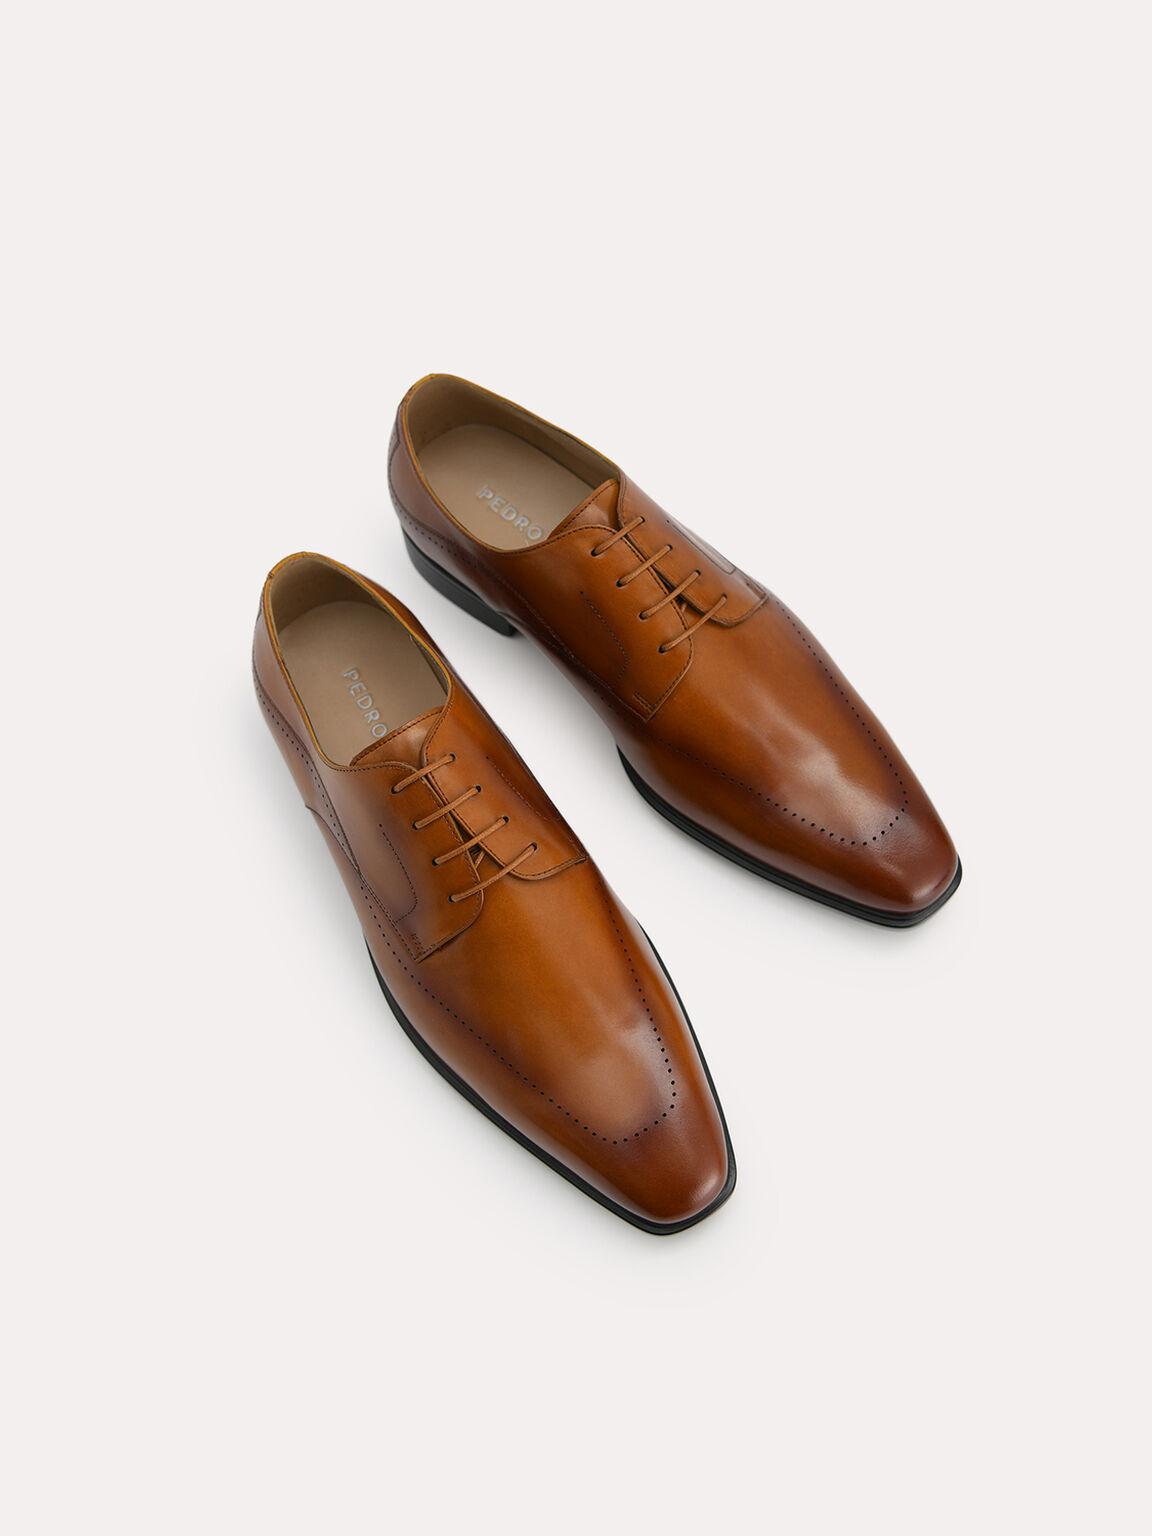 Burnished Leather Derby Shoes, Cognac, hi-res